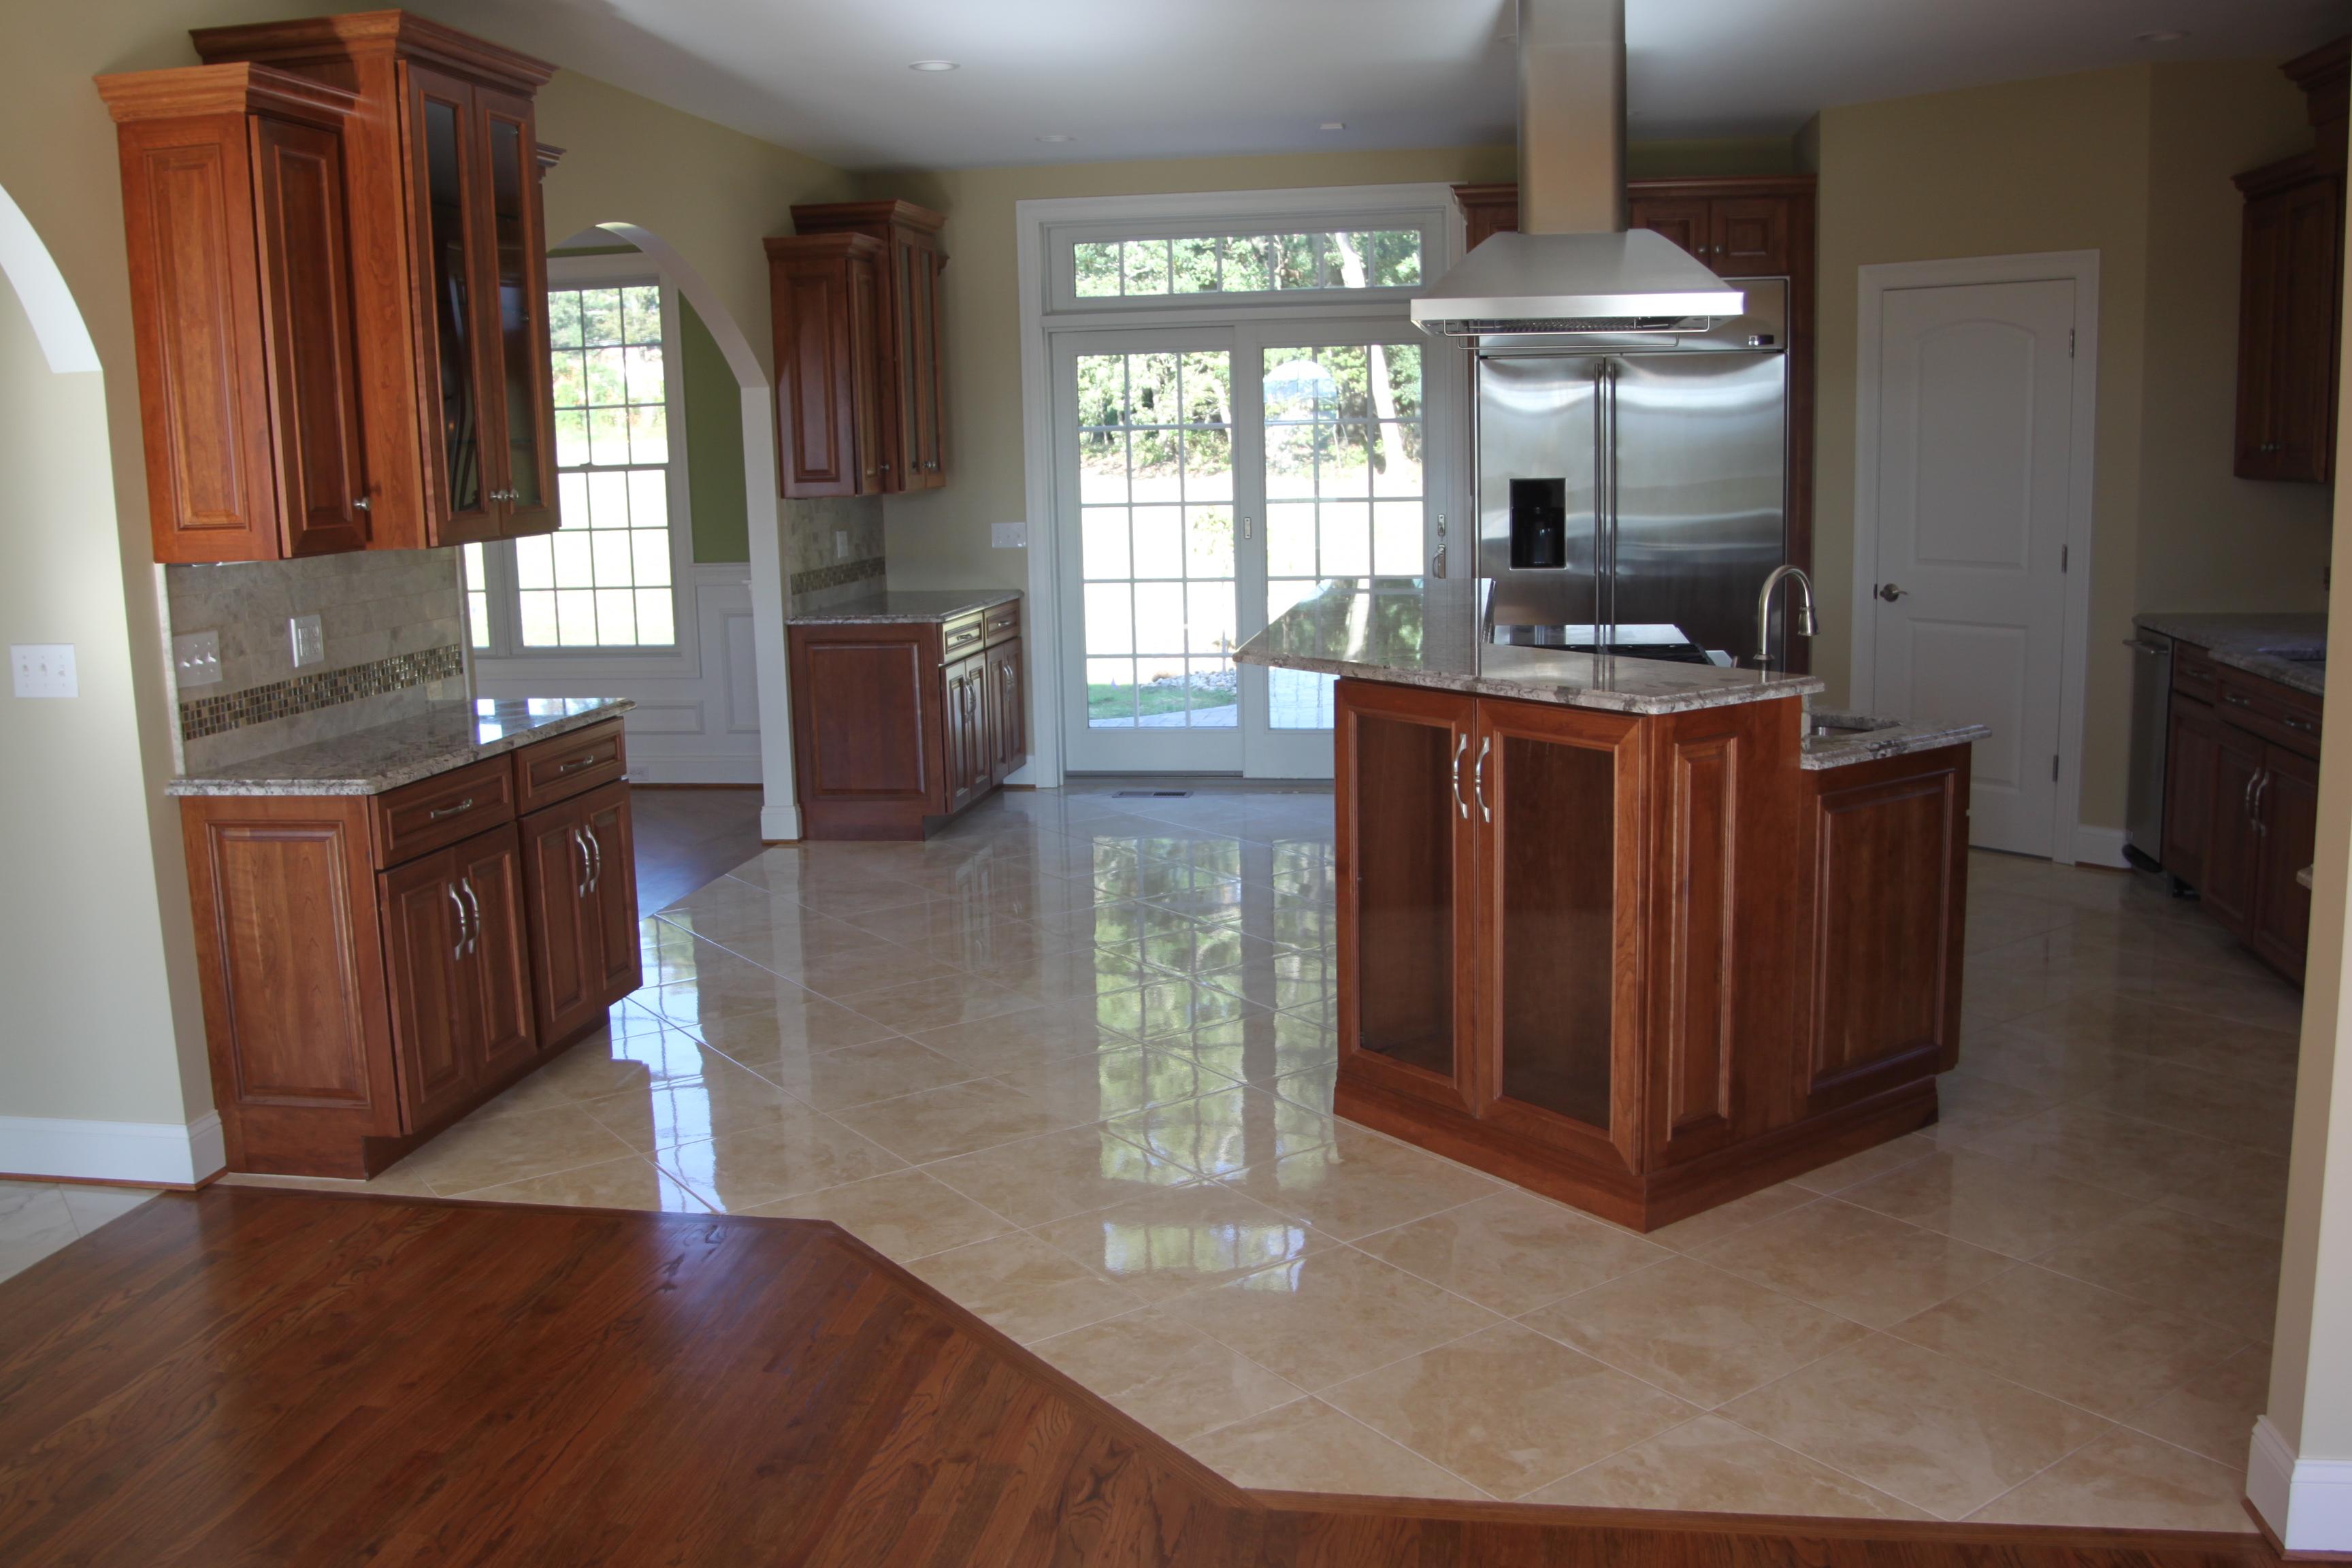 New Kitchen Floor 15 Stunning Grey Design Idea Style with sizing 3456 X 2304